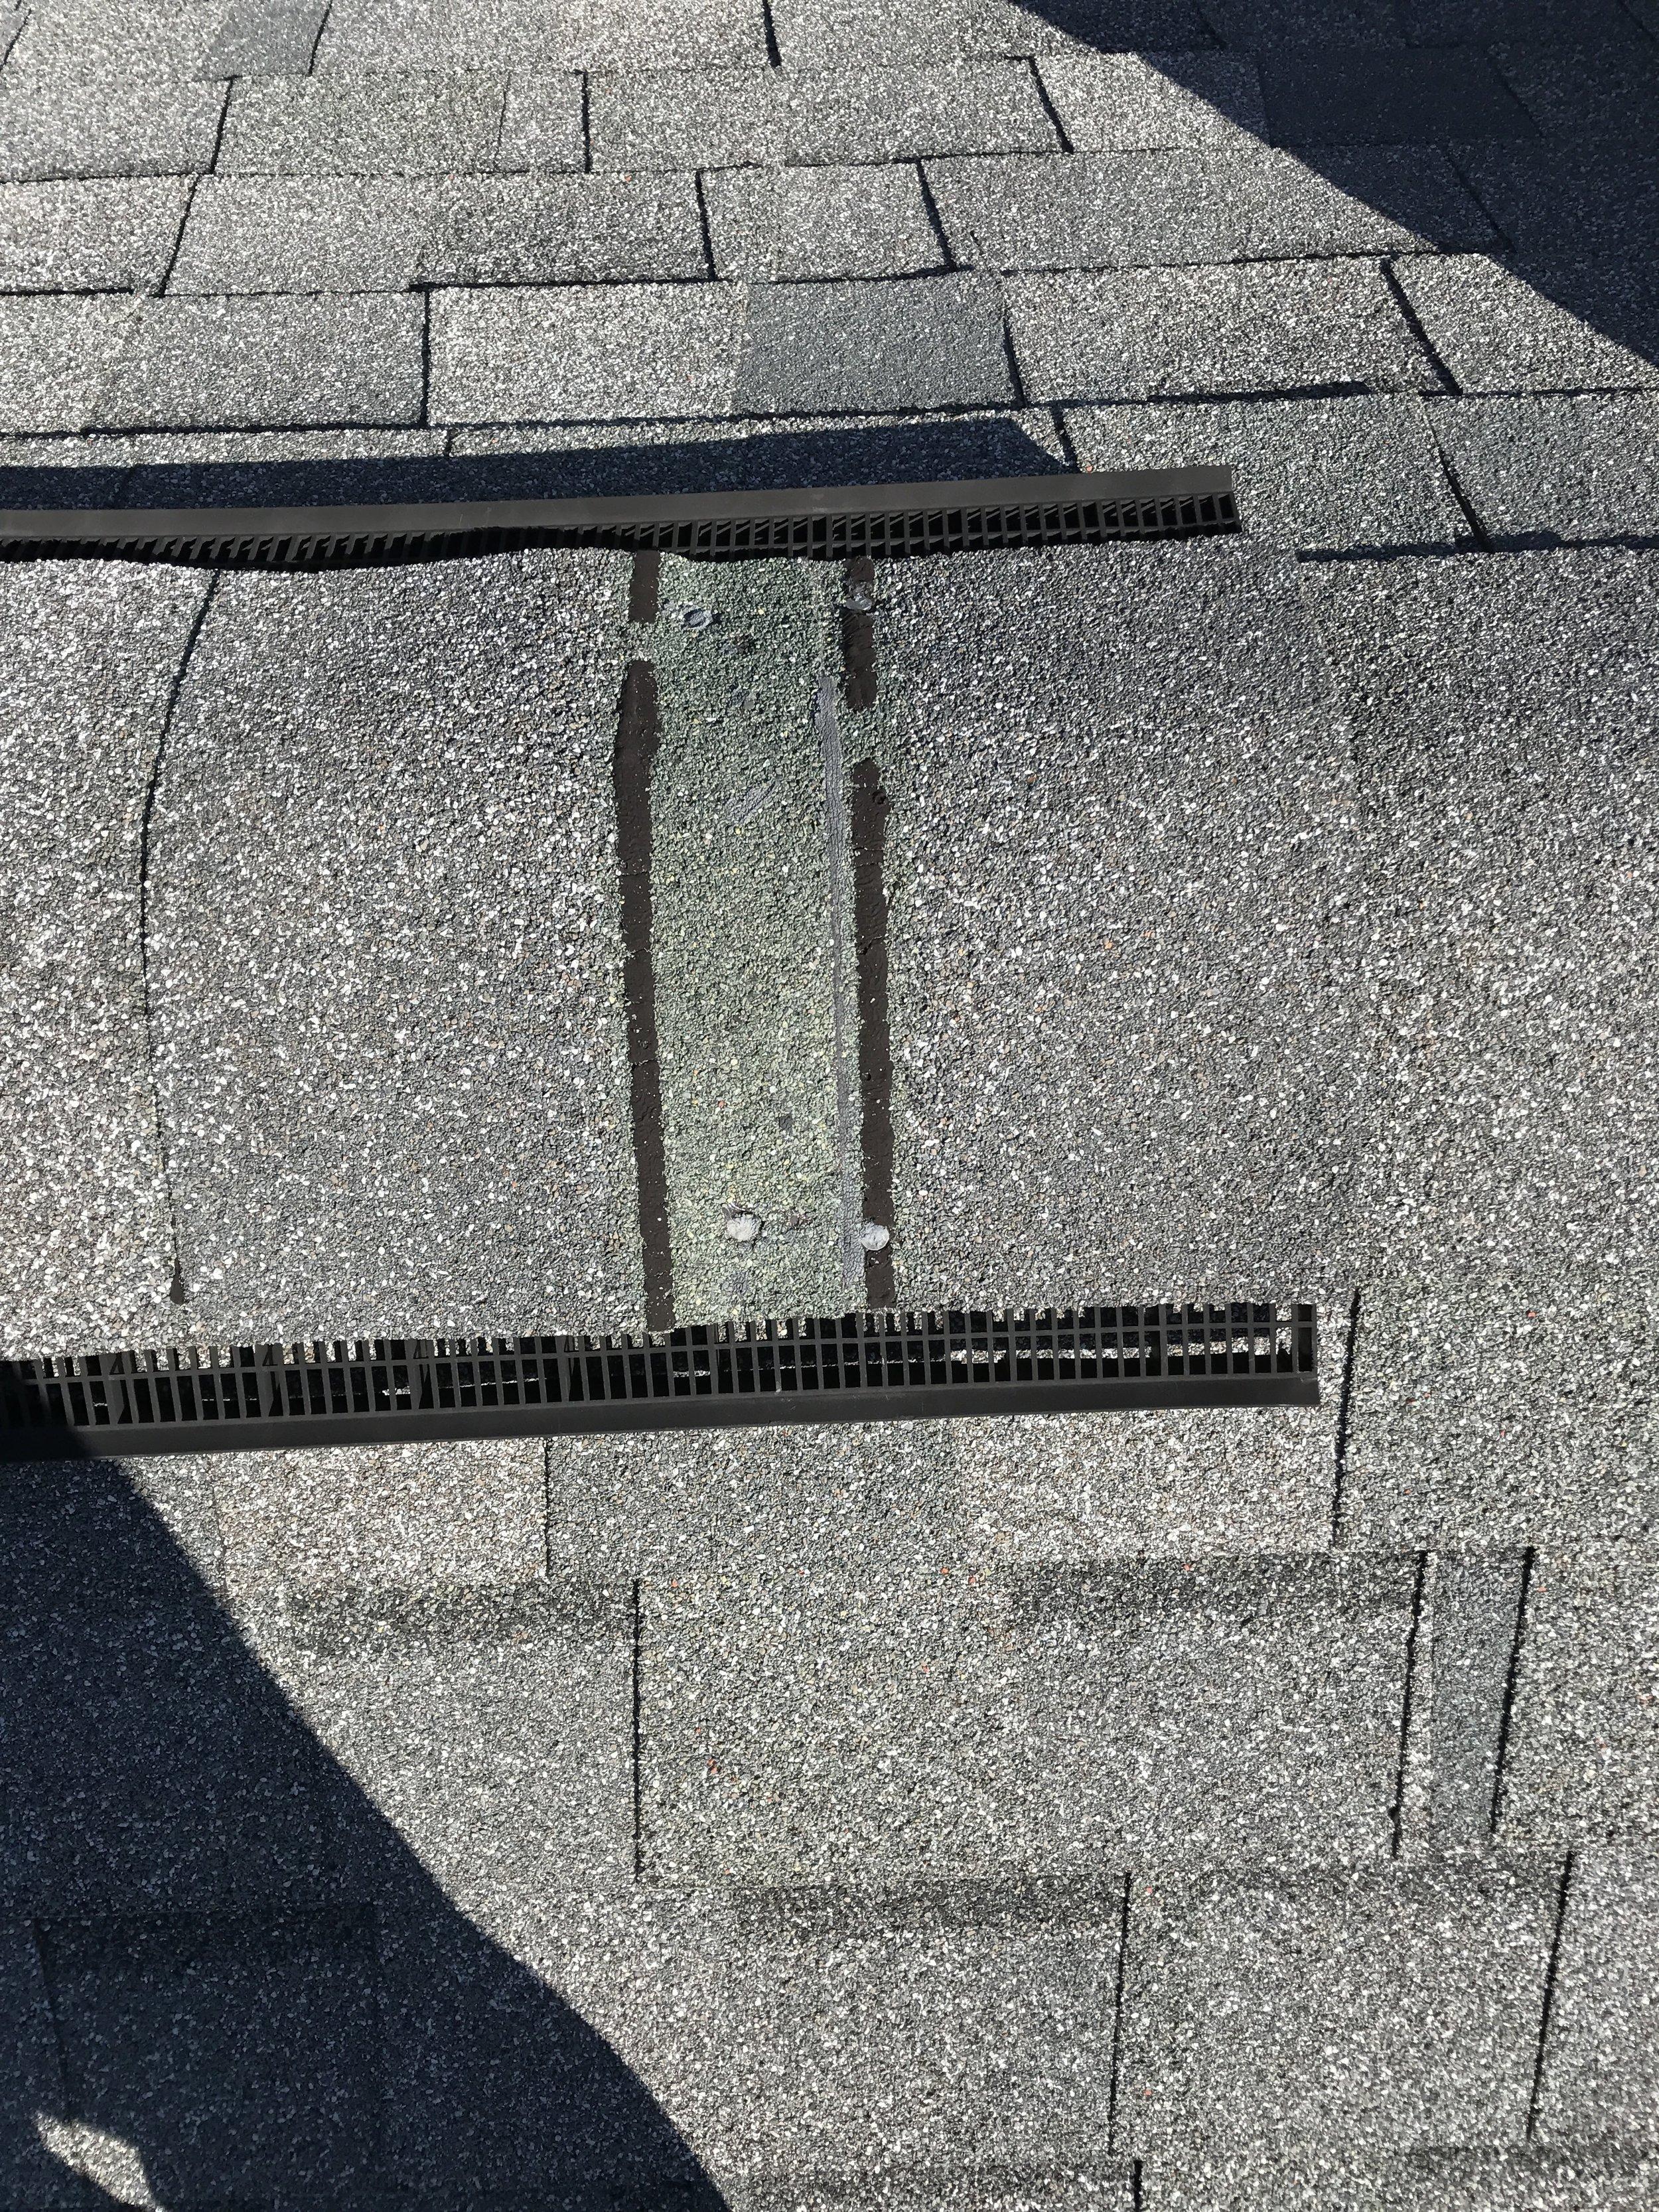 Roof Emergency